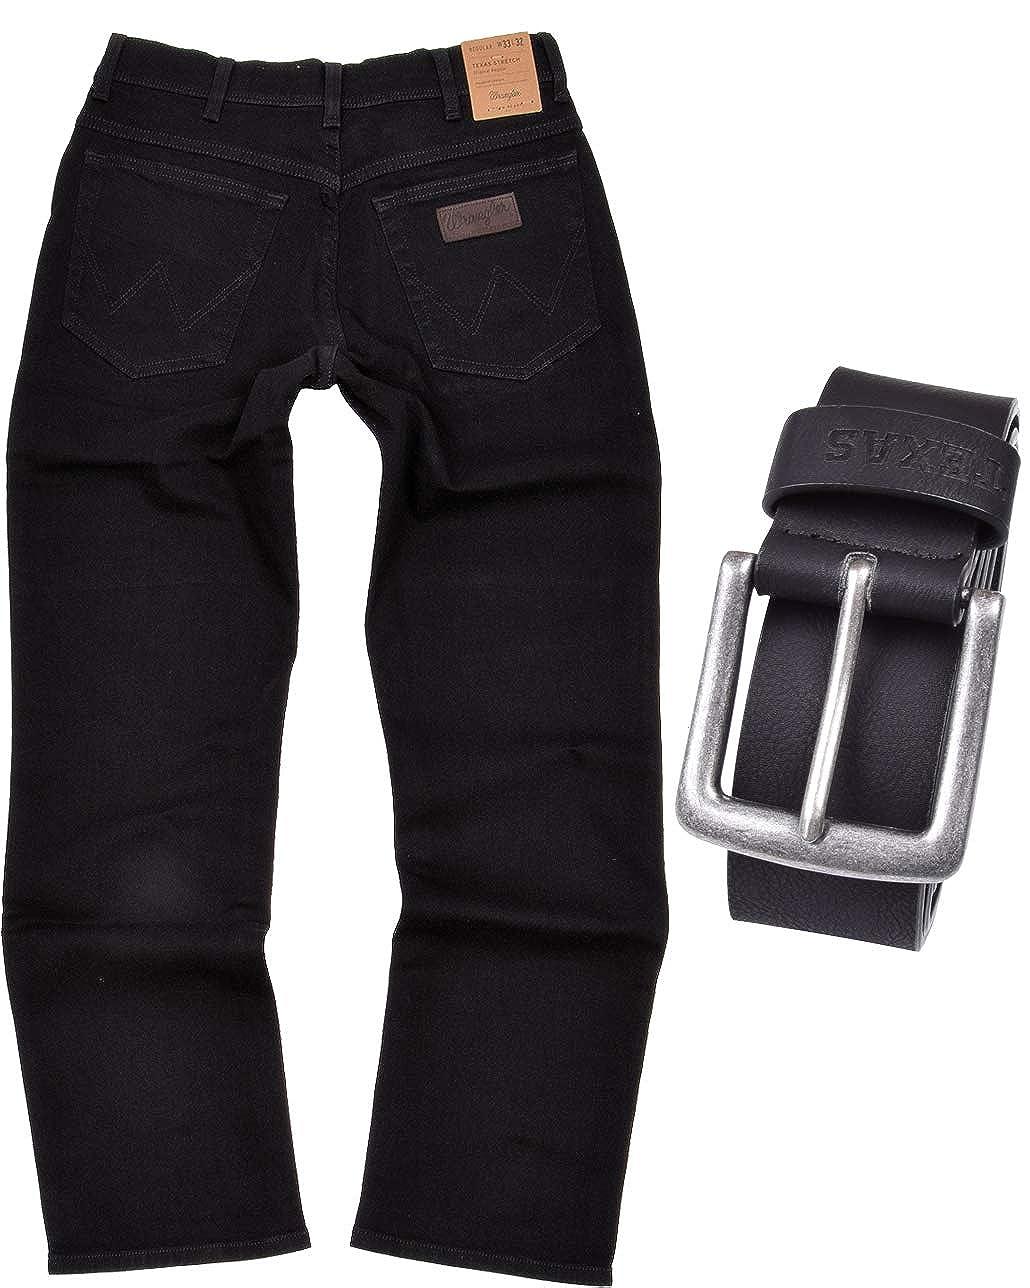 TALLA 42W / 32L. Wrangler Texas Original Straight Pantalones para Hombre